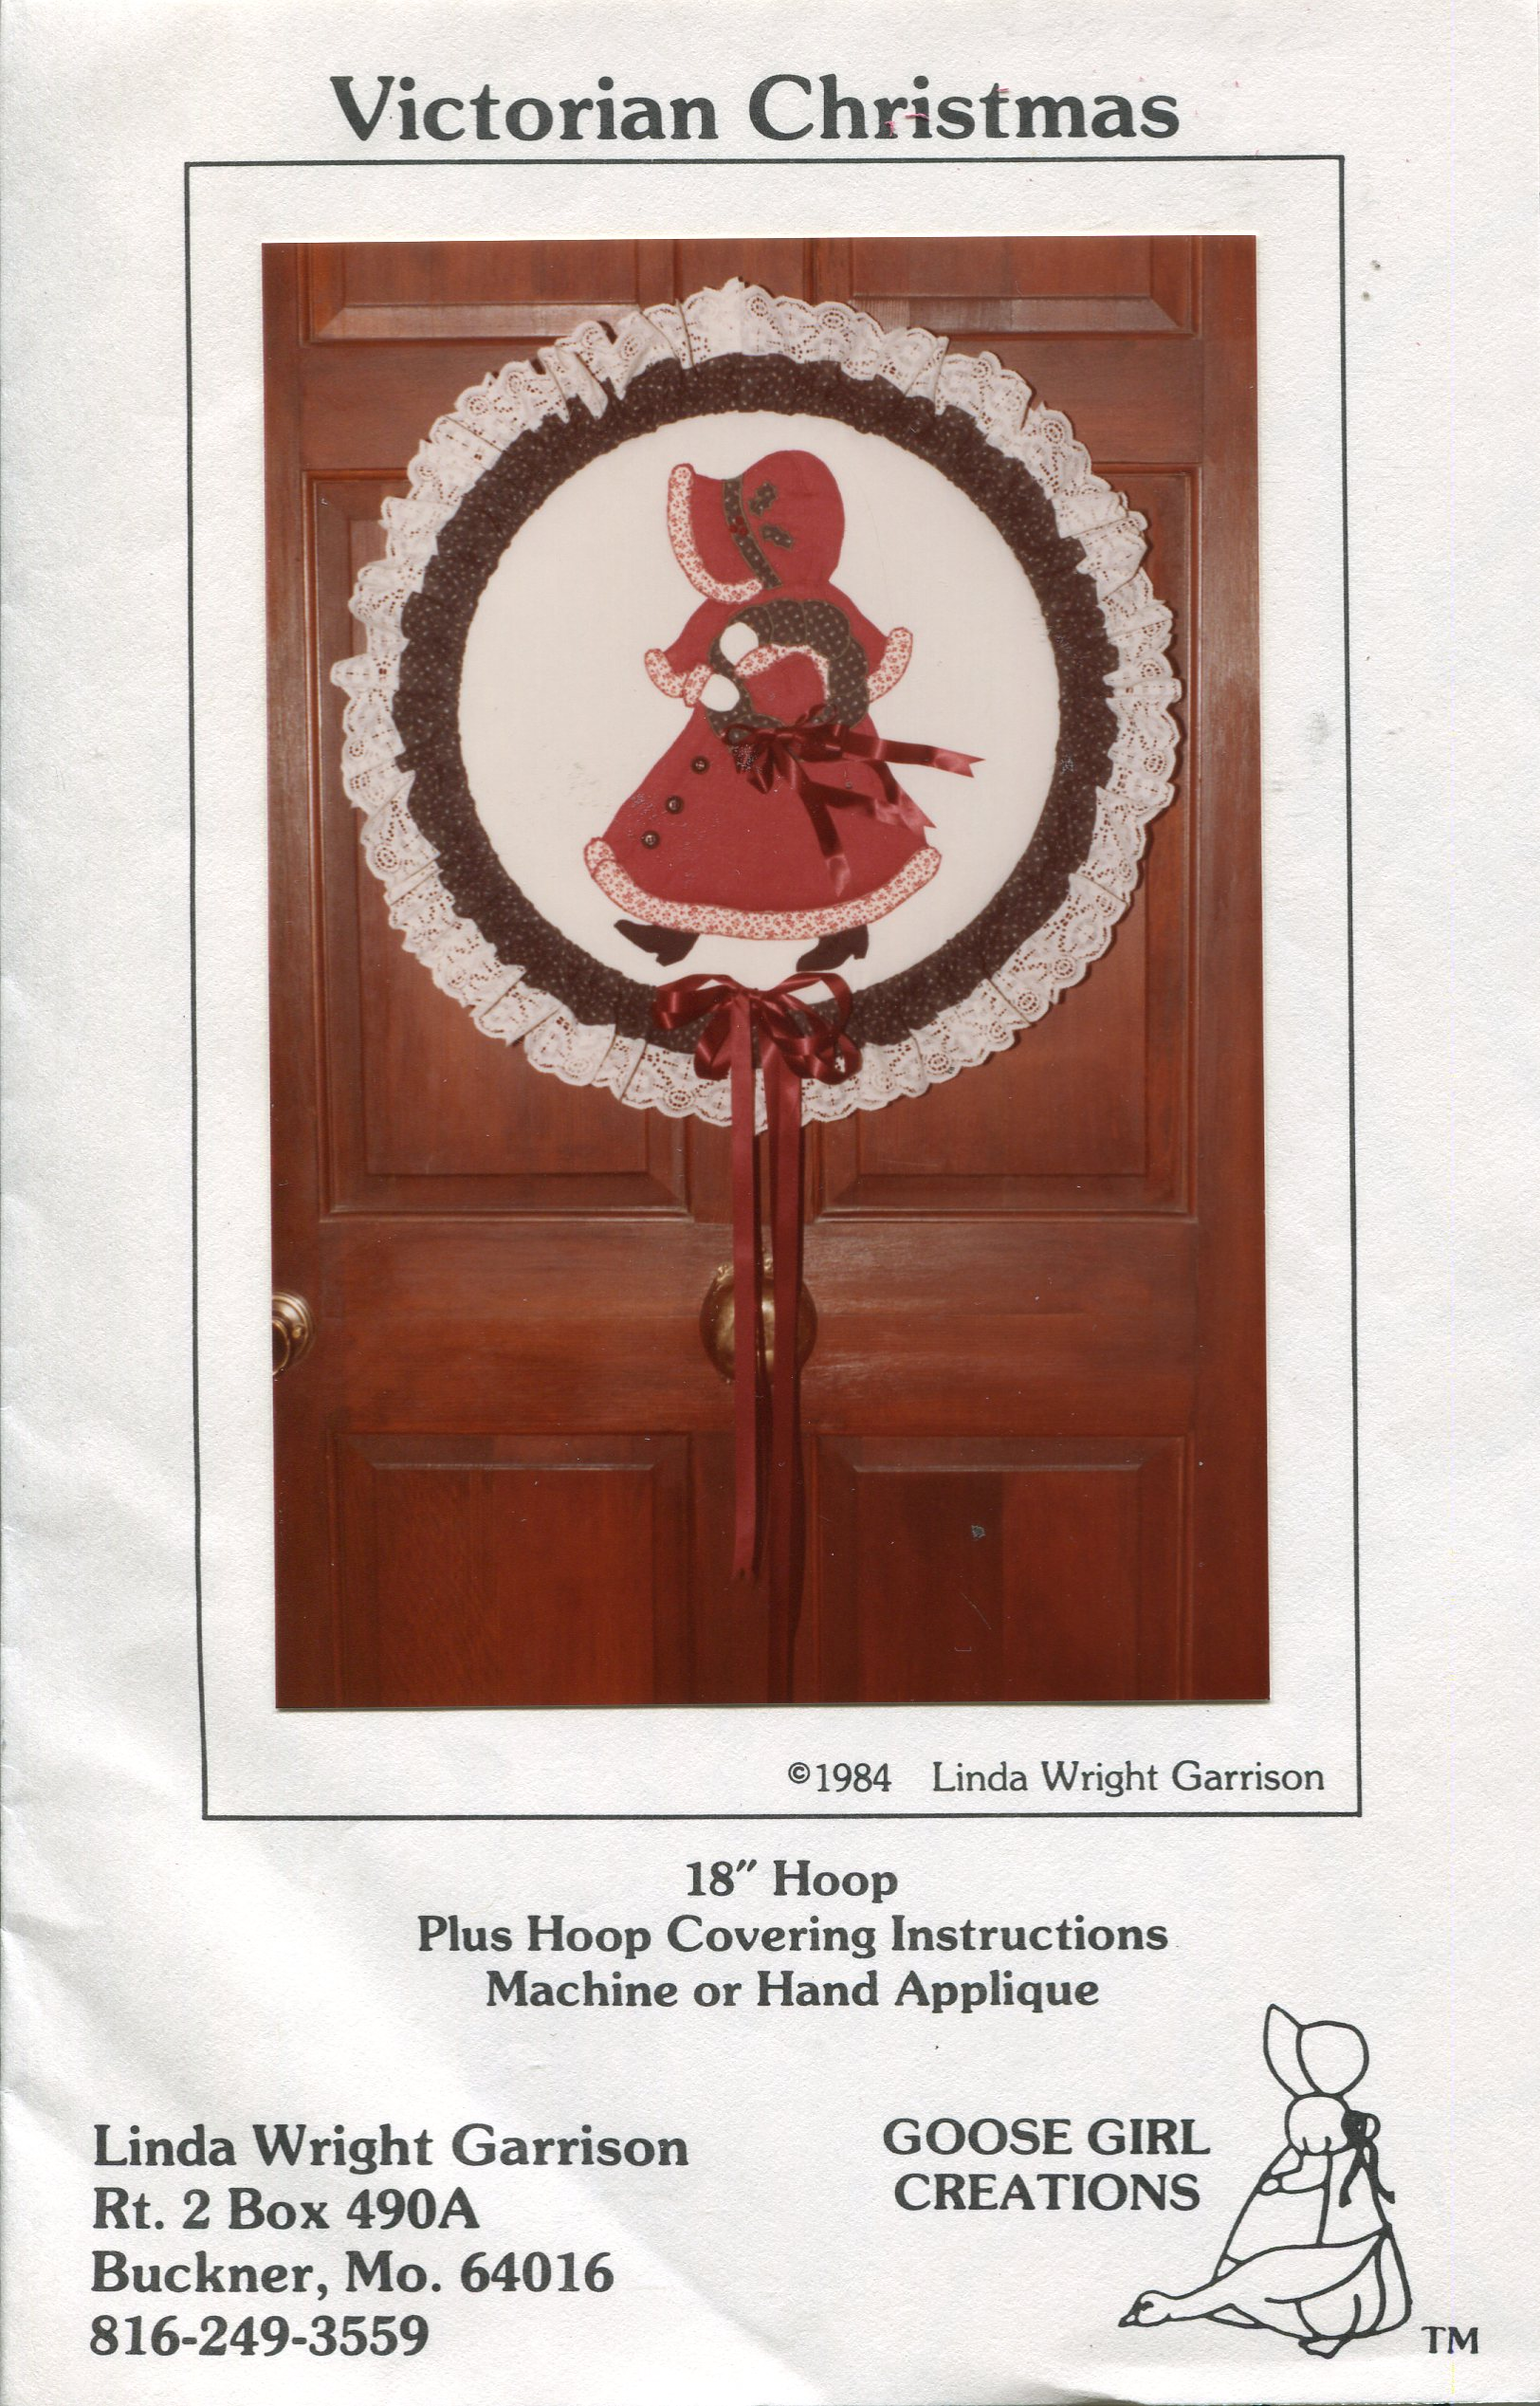 Goose Girl Creations Victorian Christmas